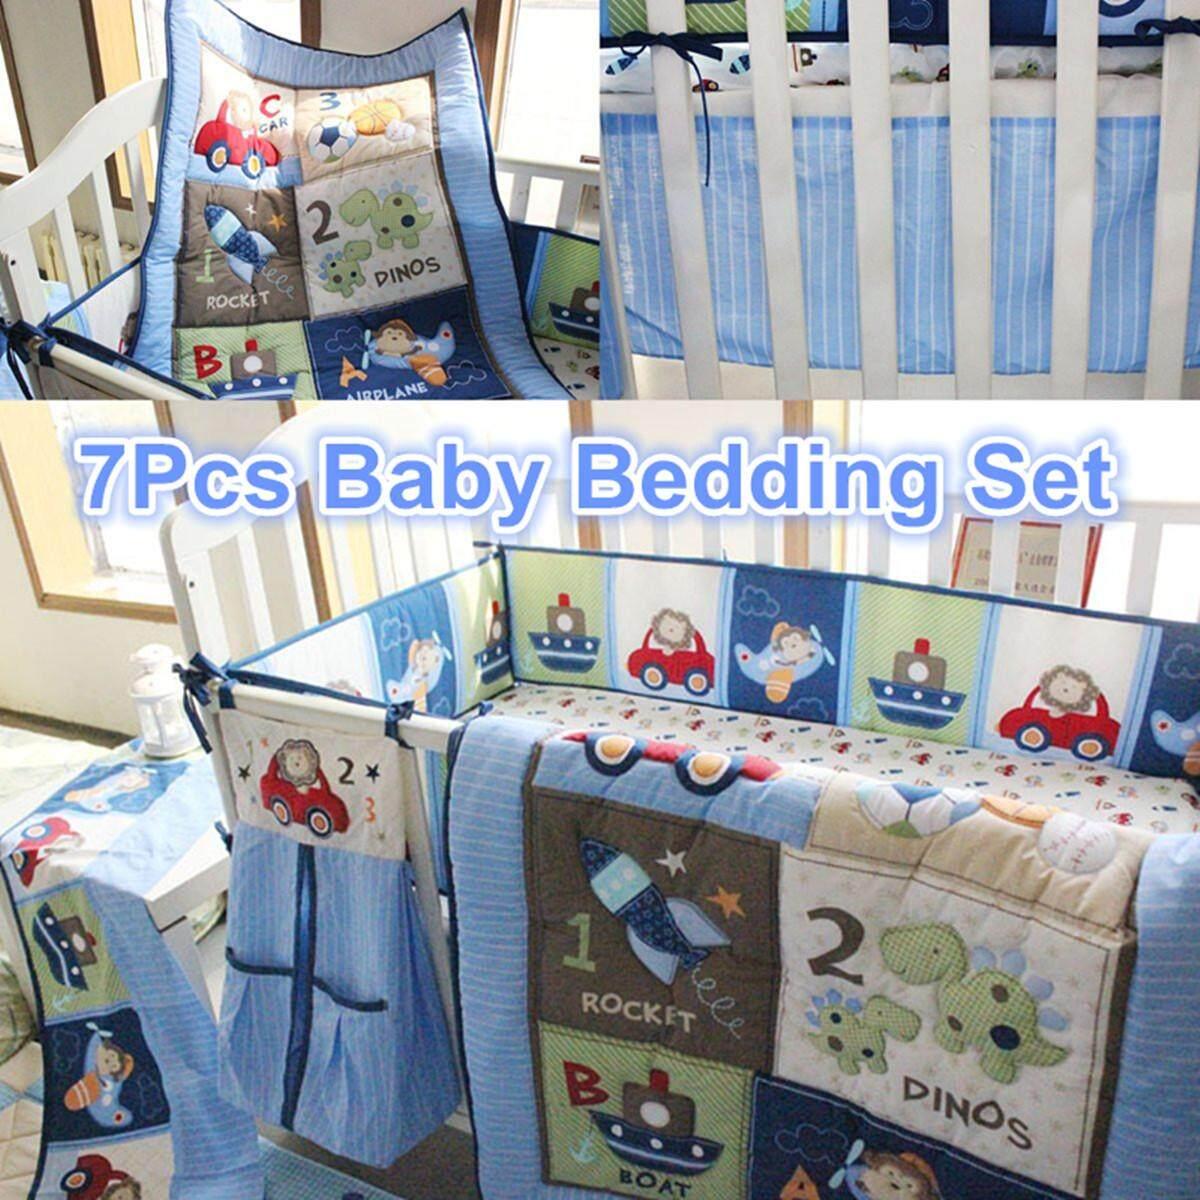 Tempat Tidur Bayi Set Tempat Cot Biru 7 Pc Nursery Popok Stacker Lembar Selimut Anak Laki-Laki Abc 123-Internasional By Teamwin.